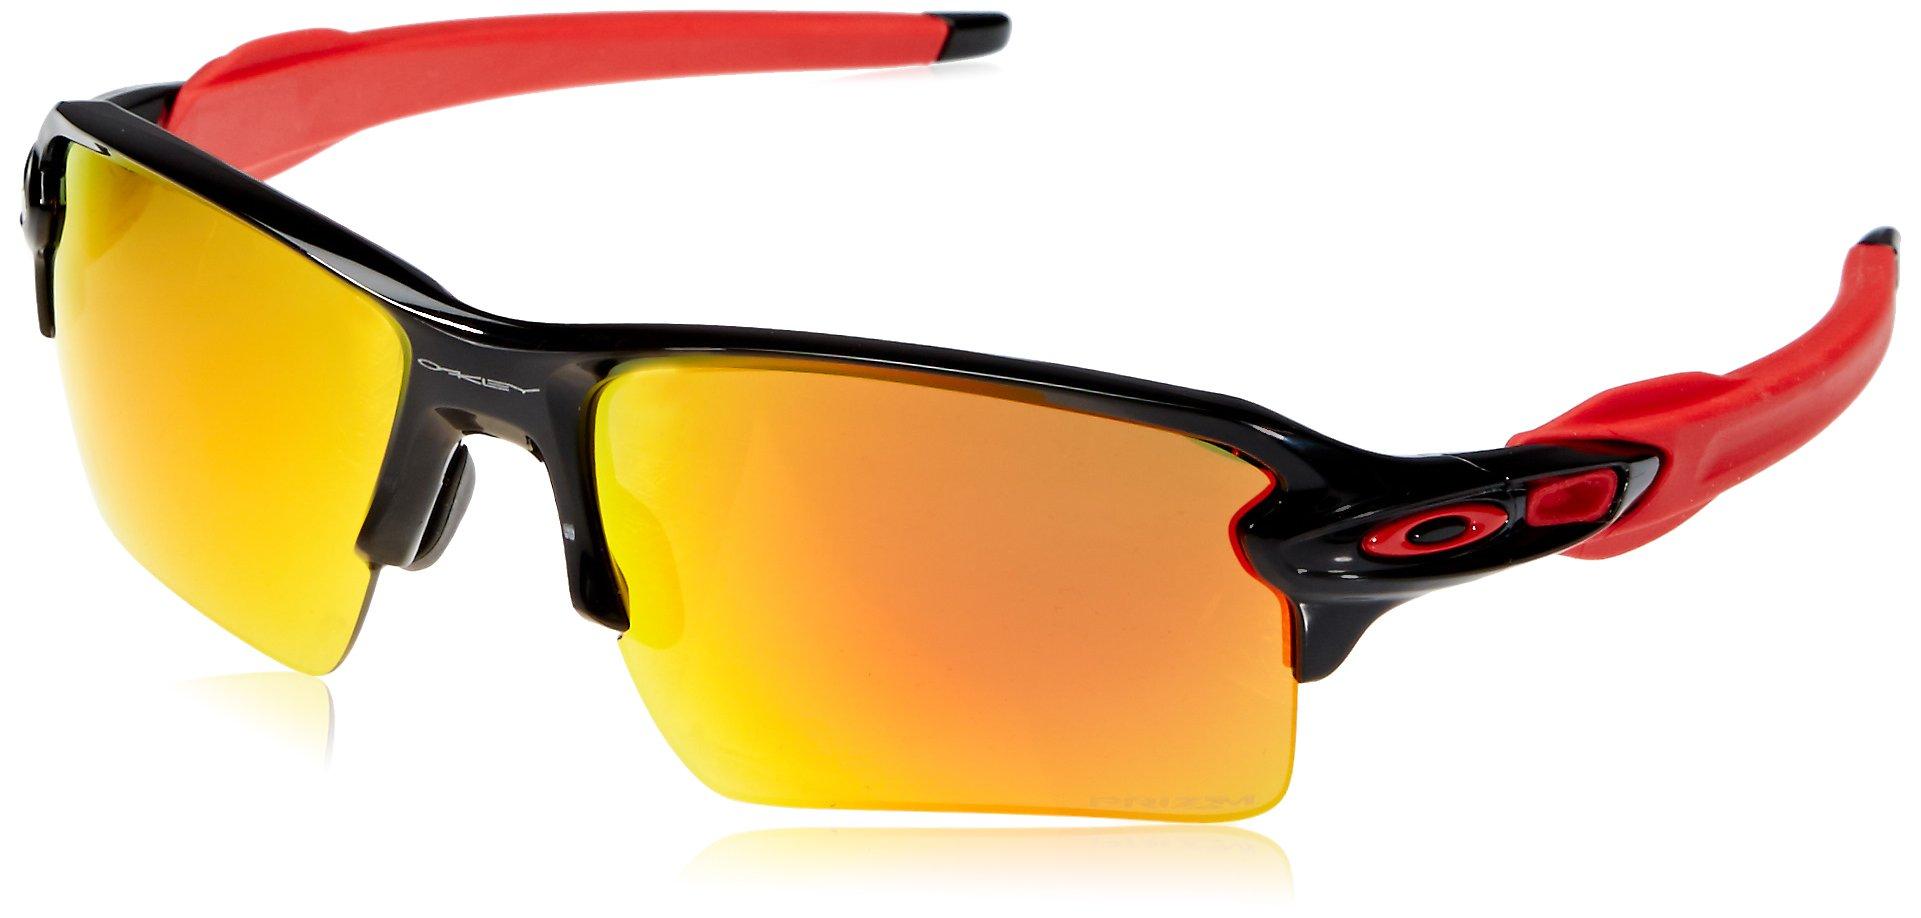 Oakley Men's Flak 2.0 XL Non-Polarized Iridium Rectangular Sunglasses, POLISHED BLACK, 59.0 mm